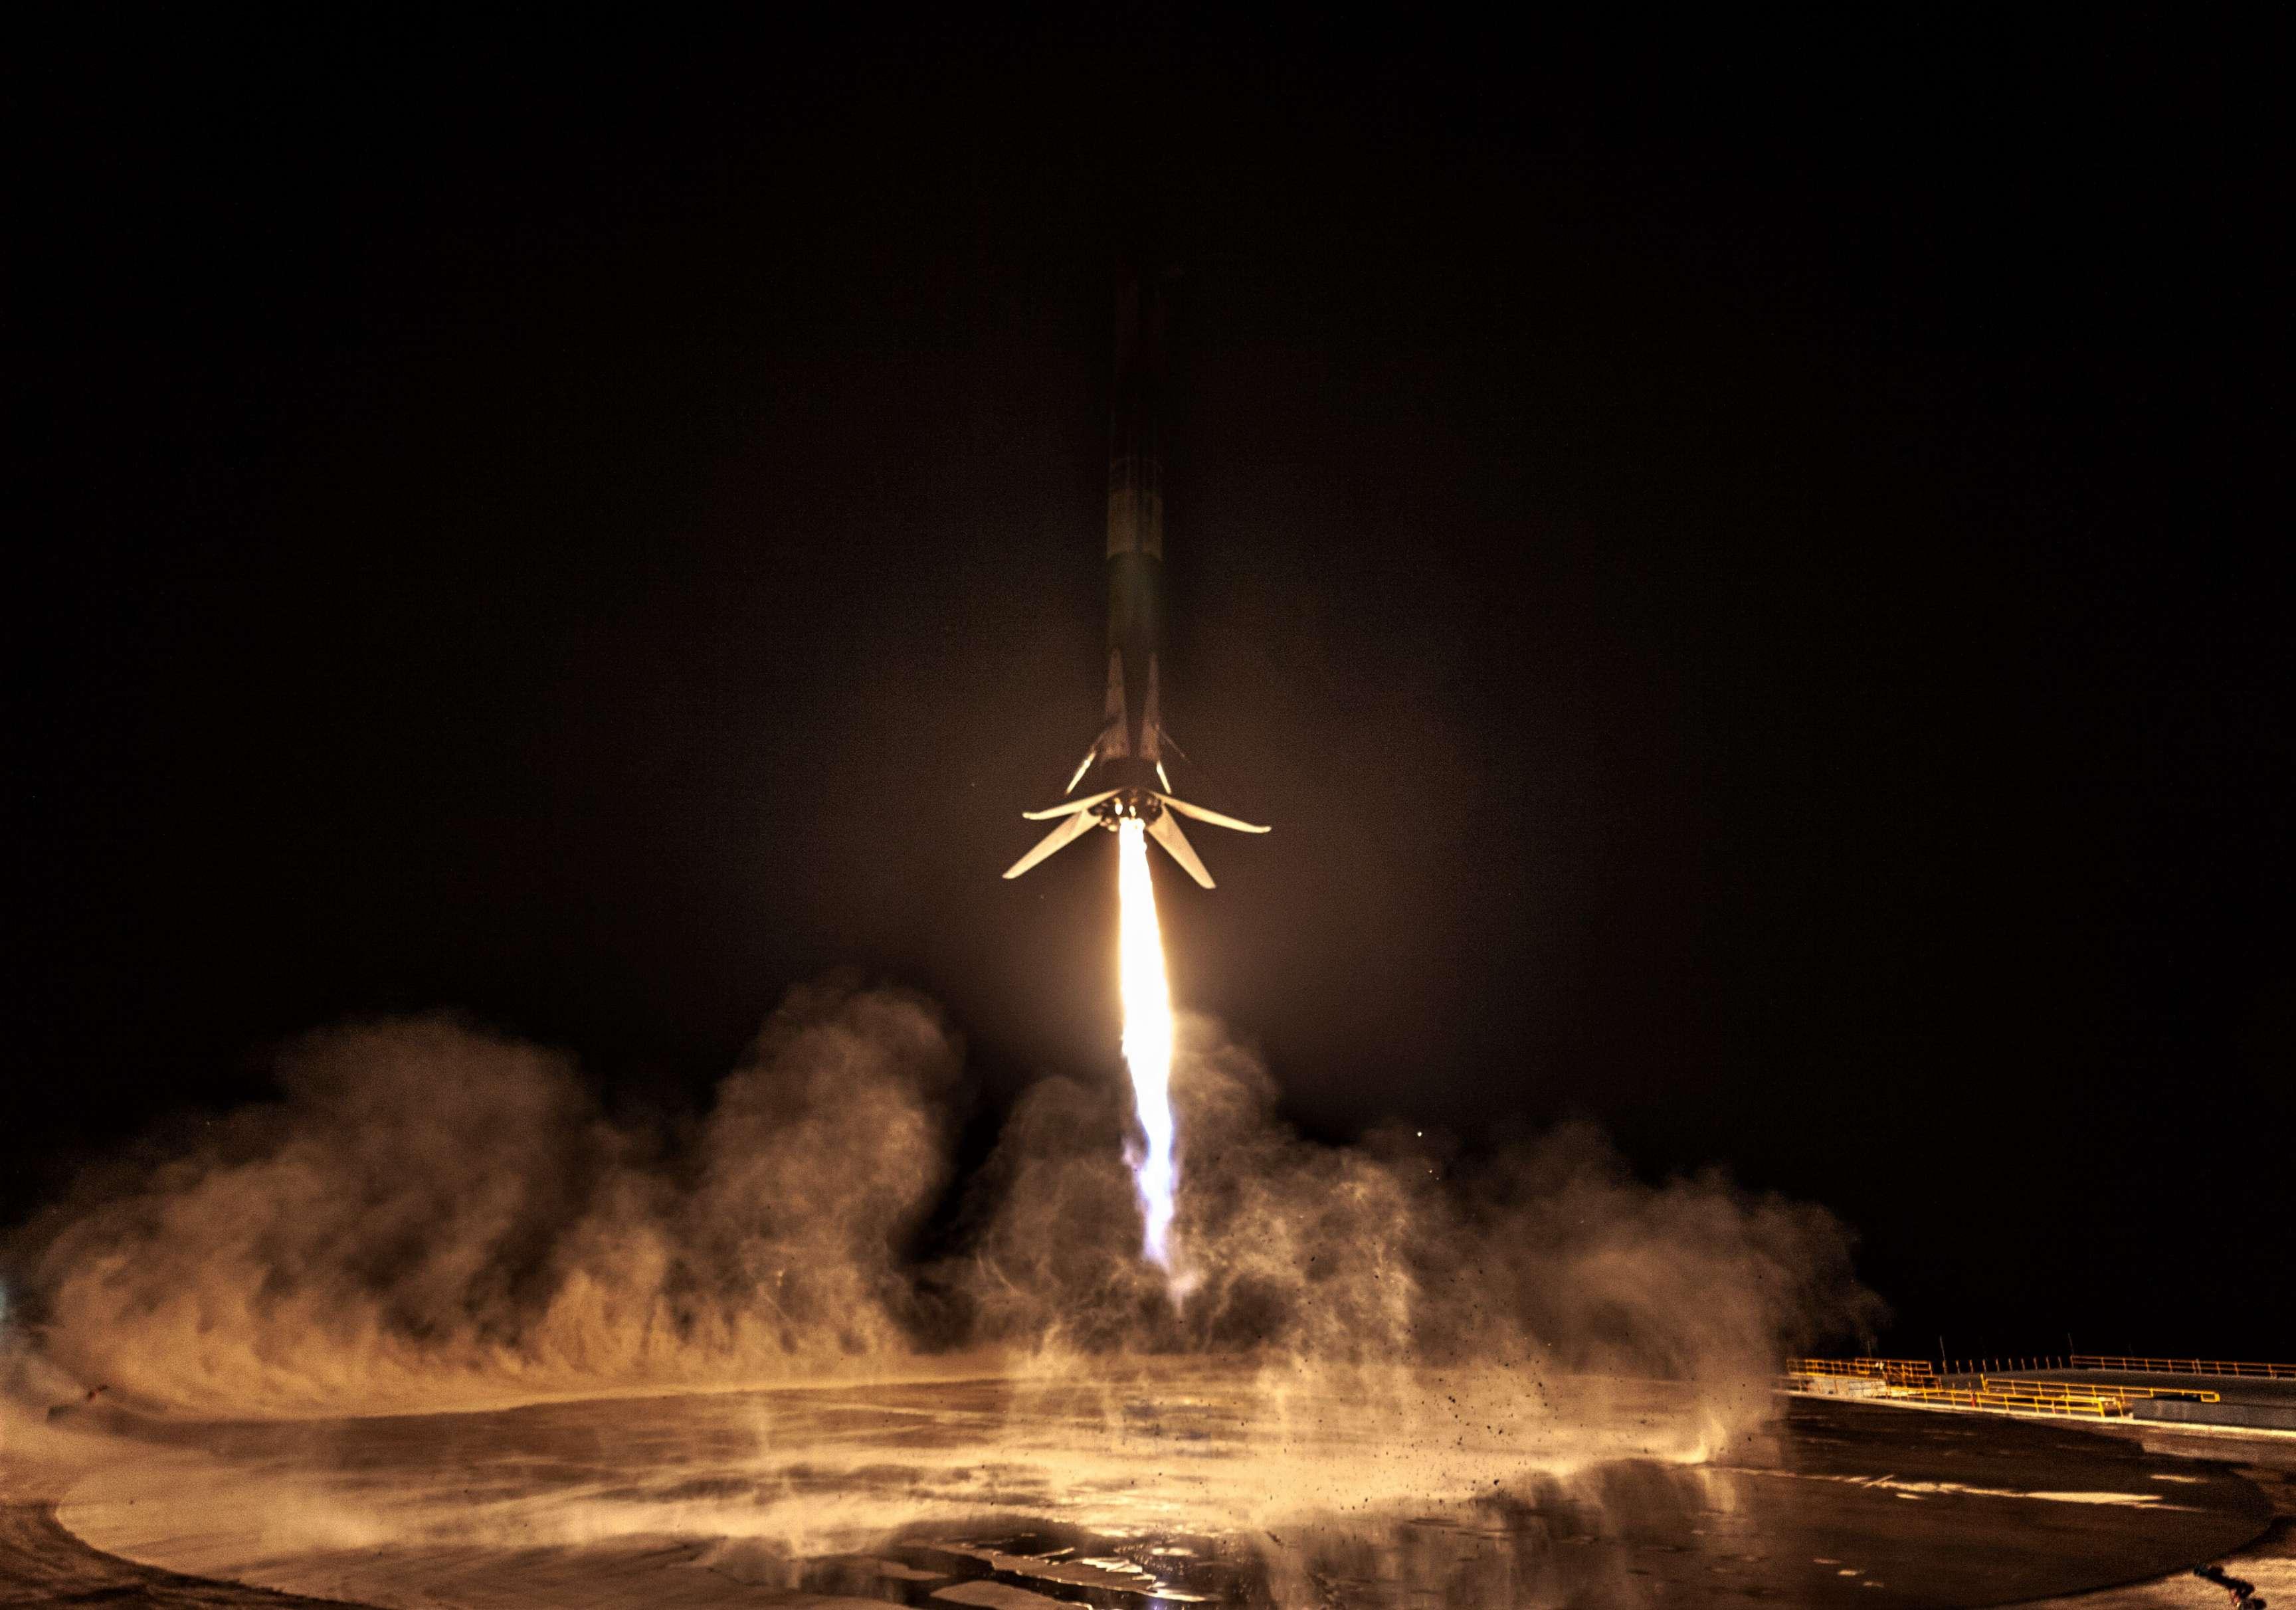 SAOCOM 1A B1048 landing (SpaceX) 2(c)